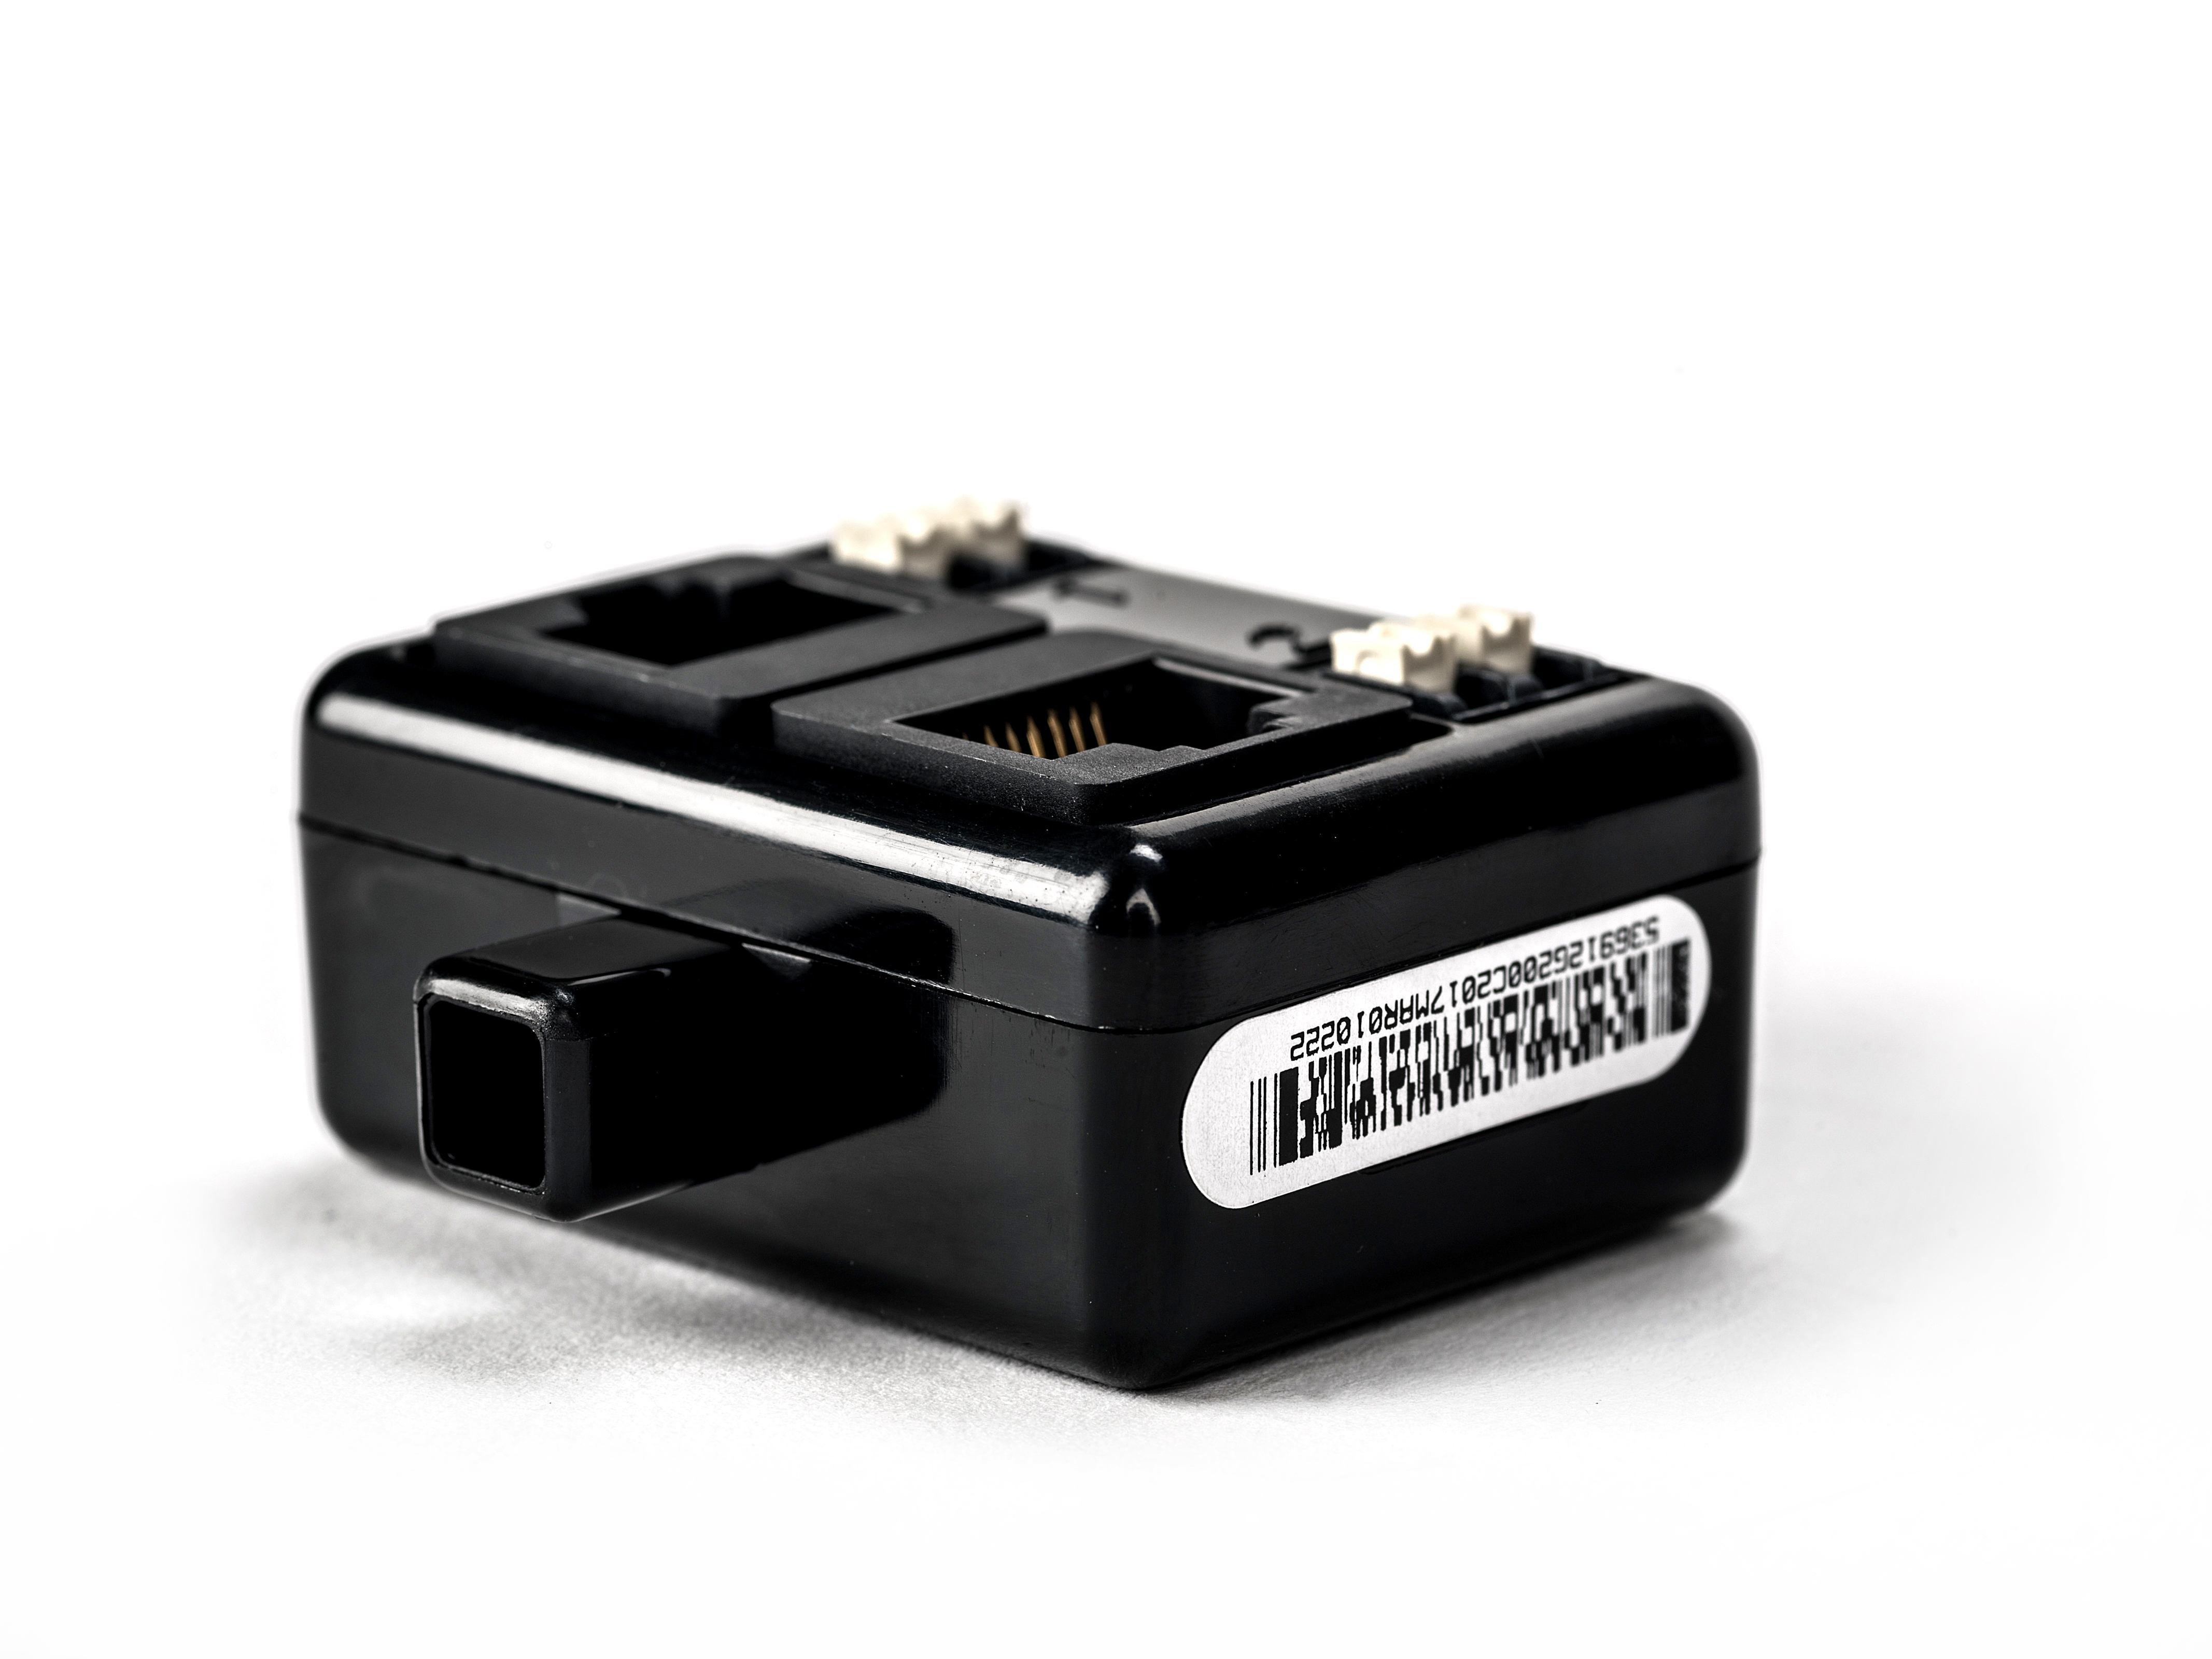 SN-TH Vertiv Liebert SN Sensor Single Modular Temperature and Humidity Probe